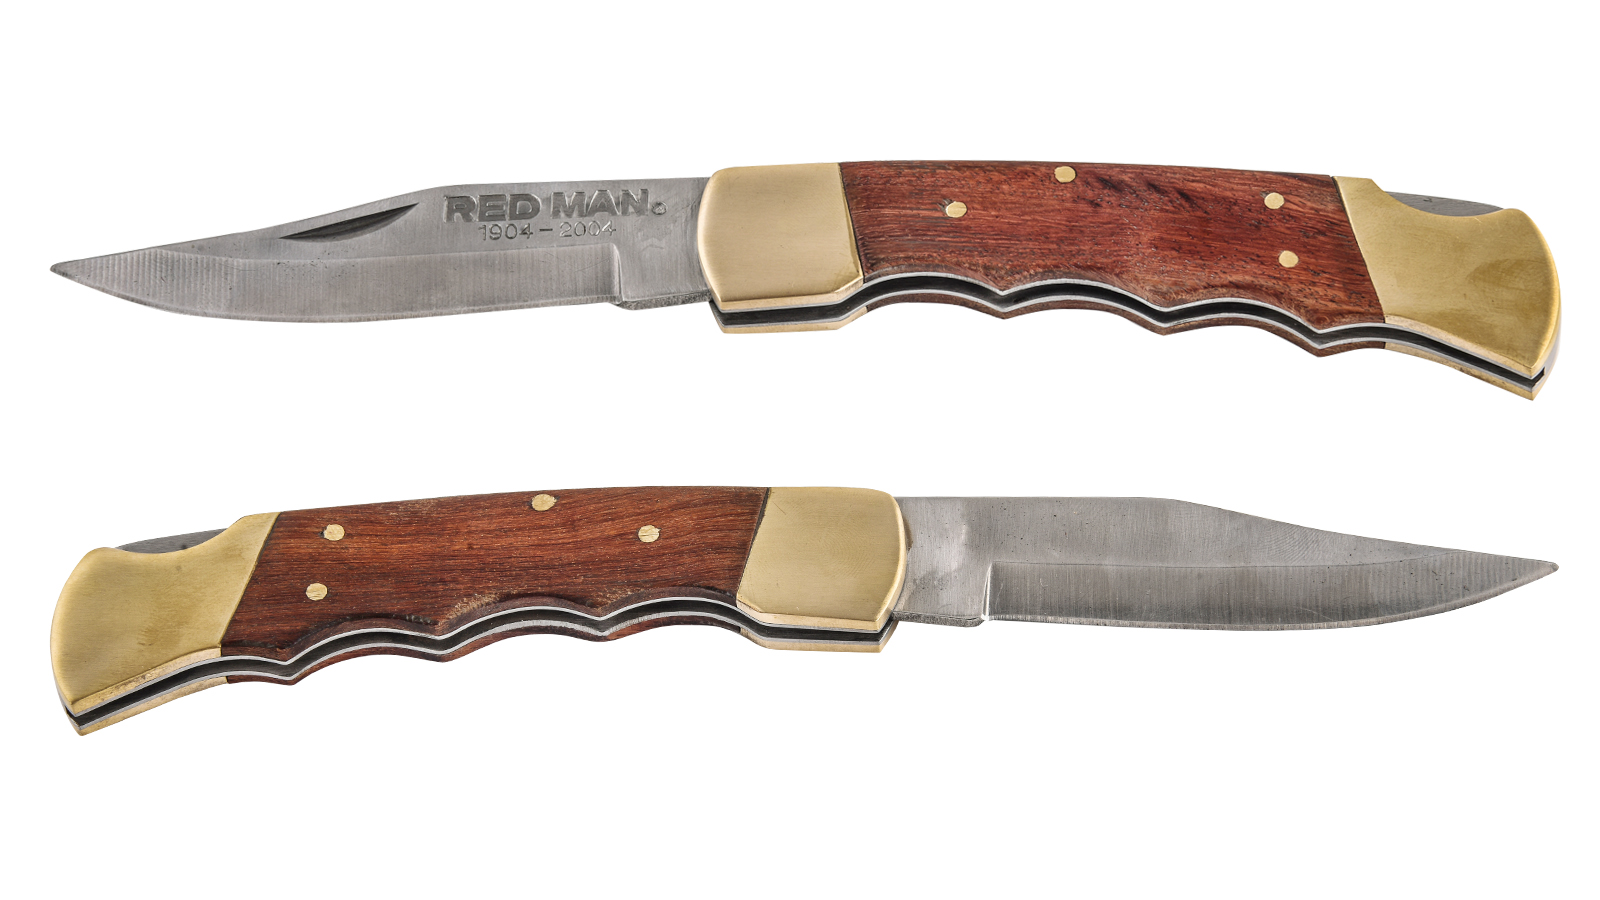 Эксклюзивный нож Red Man 100th Anniversary 1904-2004 Commemorative Lockback Knife (США)